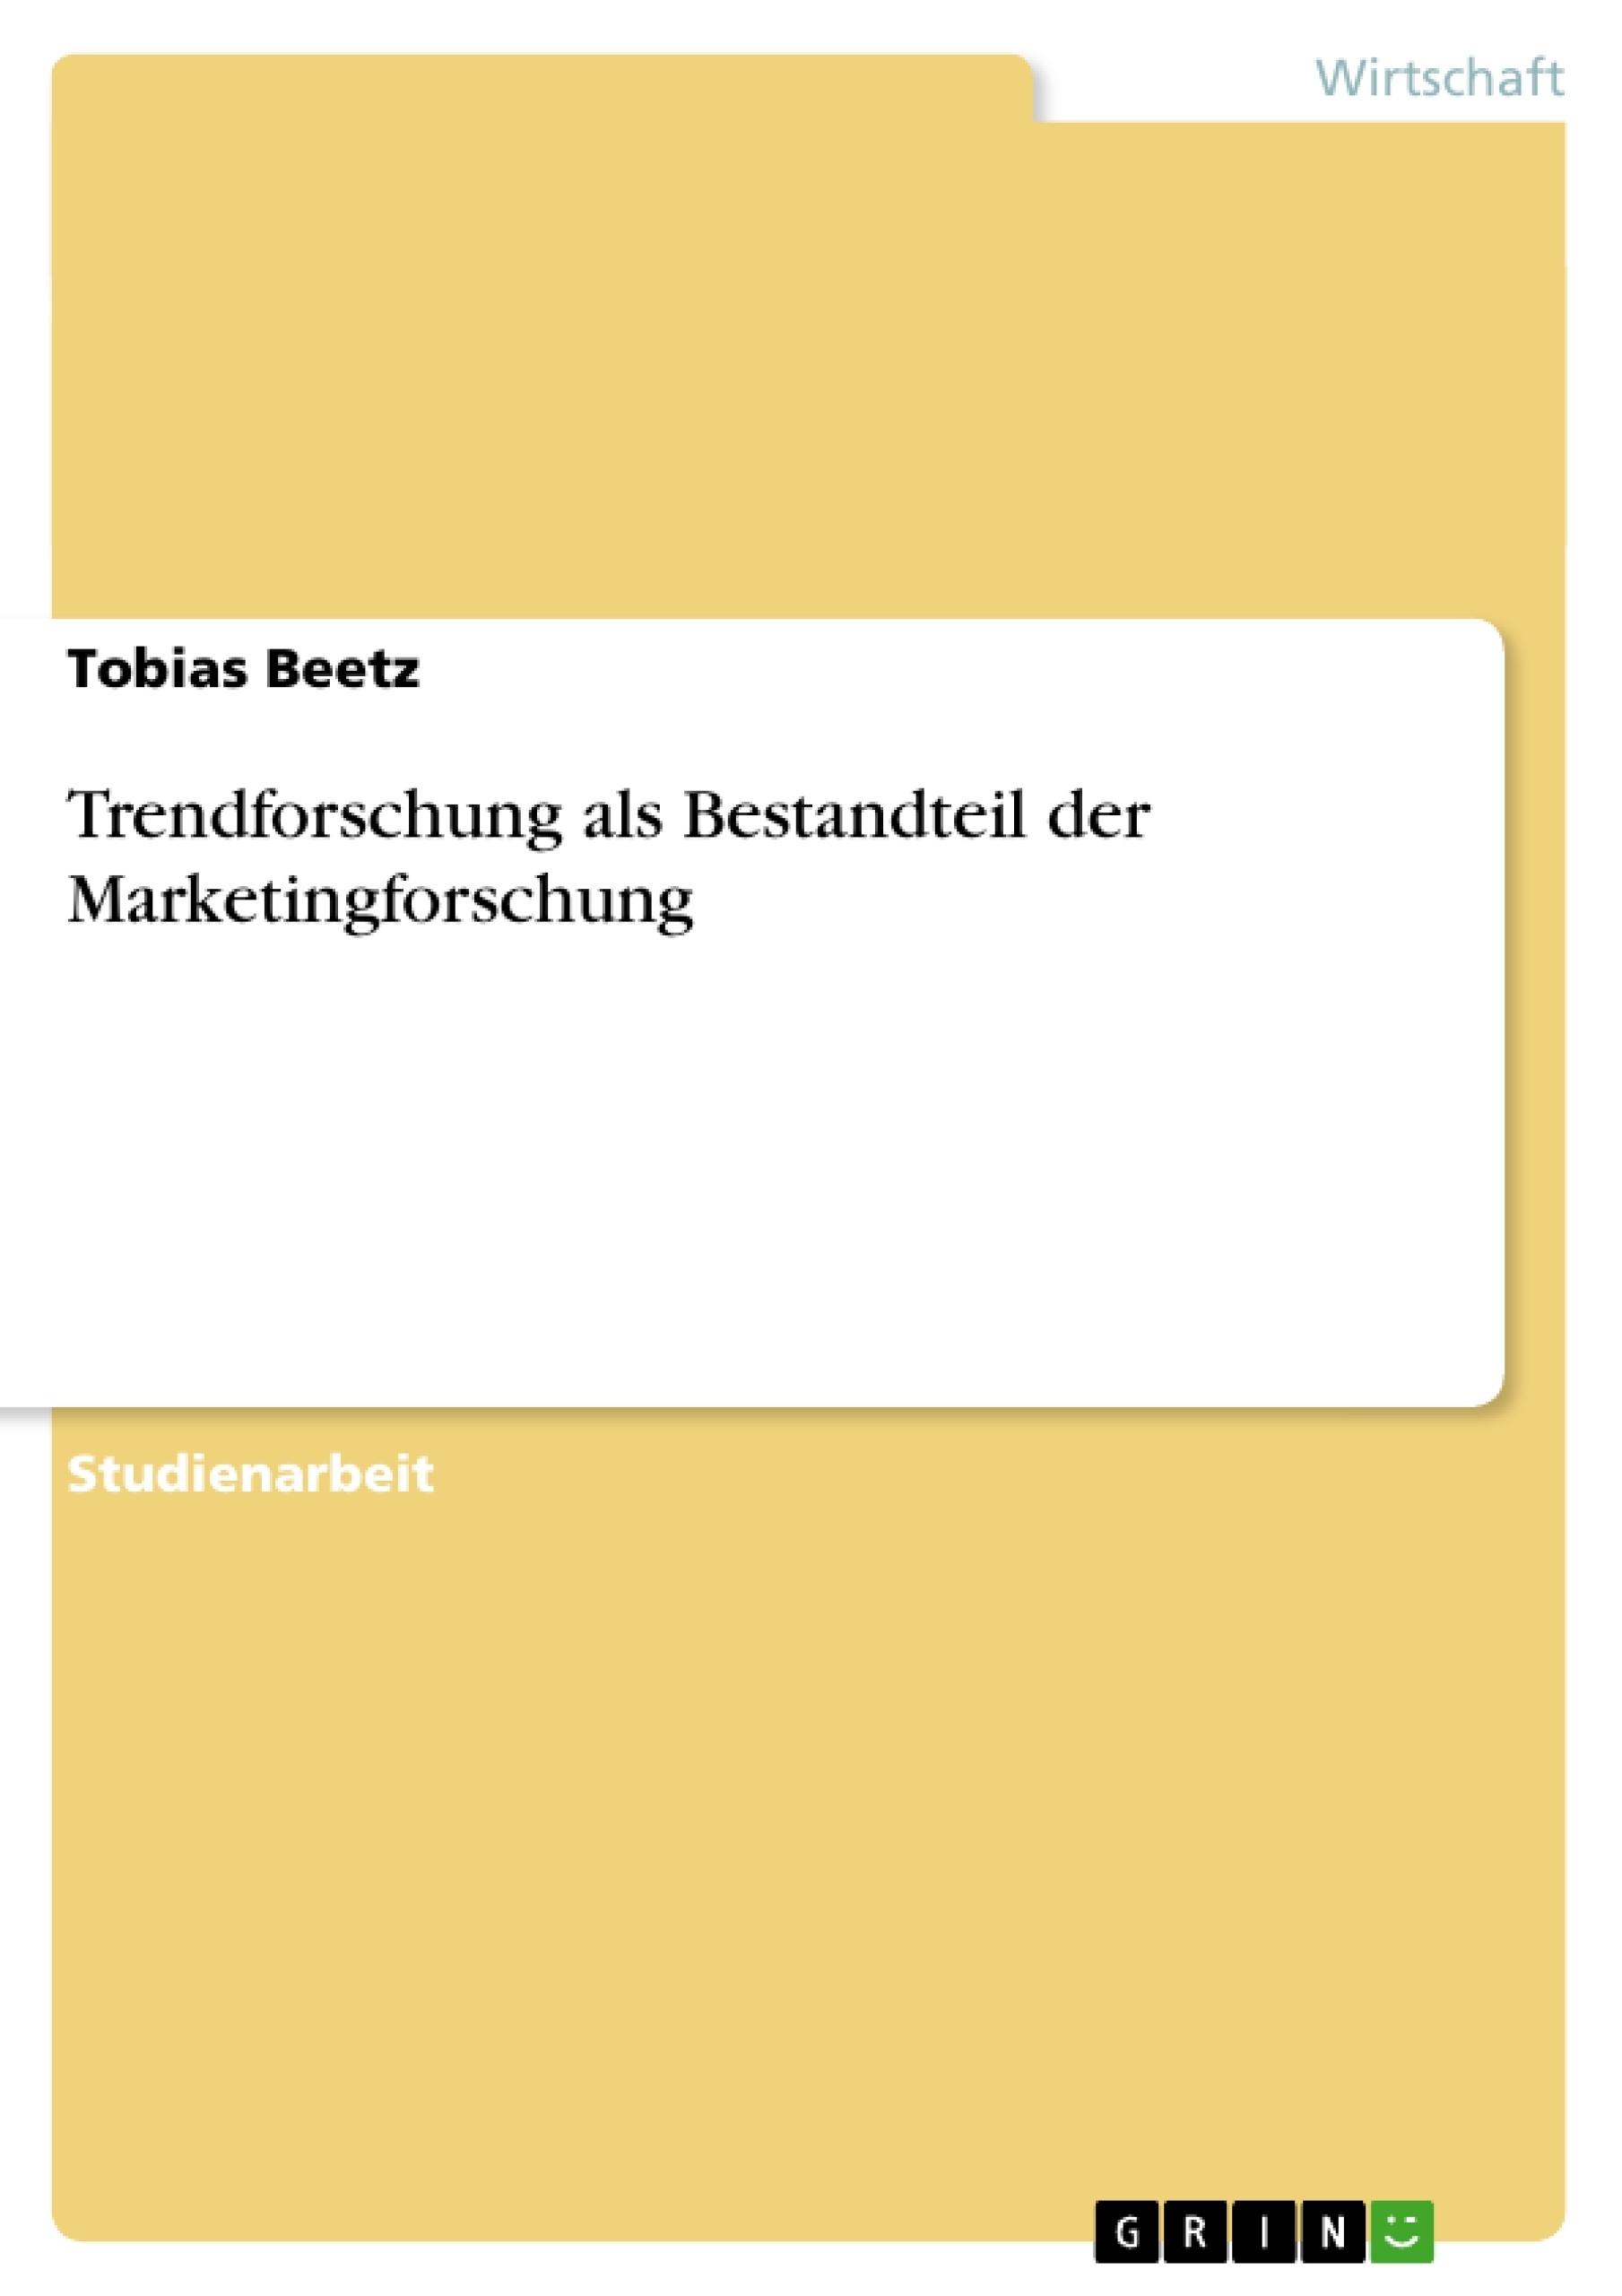 Titel: Trendforschung als Bestandteil der Marketingforschung